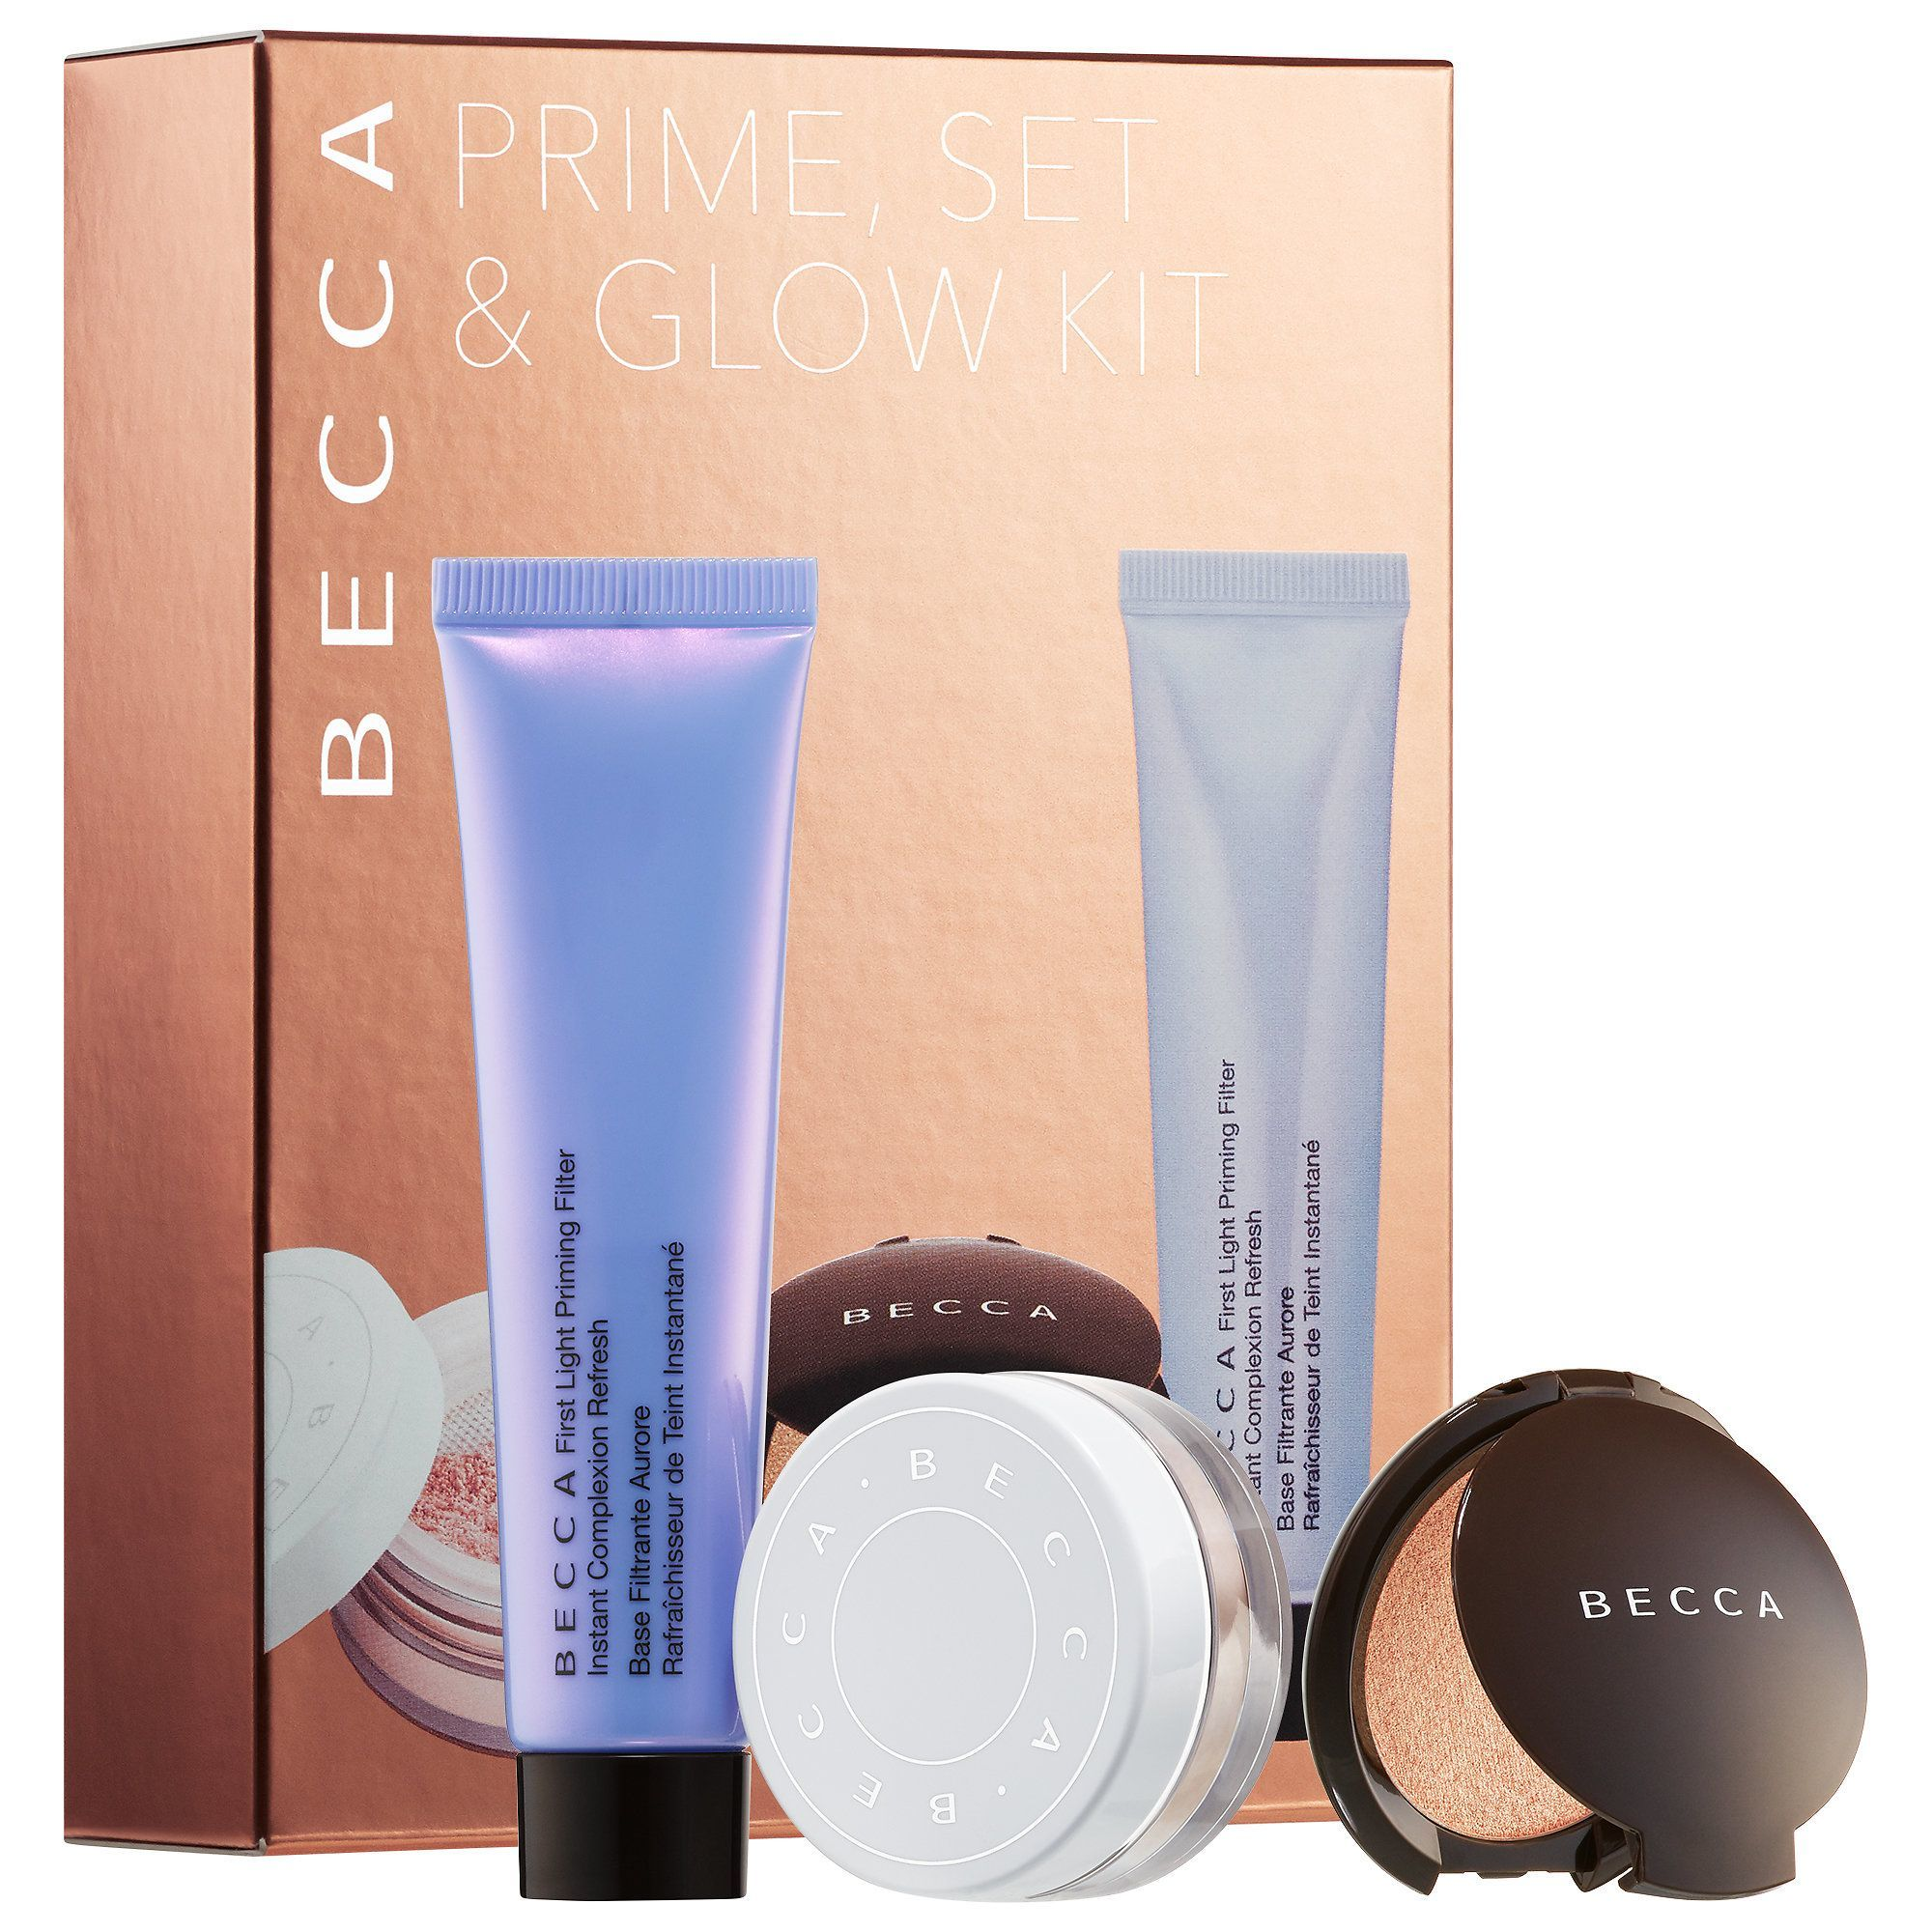 BECCA Prime Set & Glow Kit